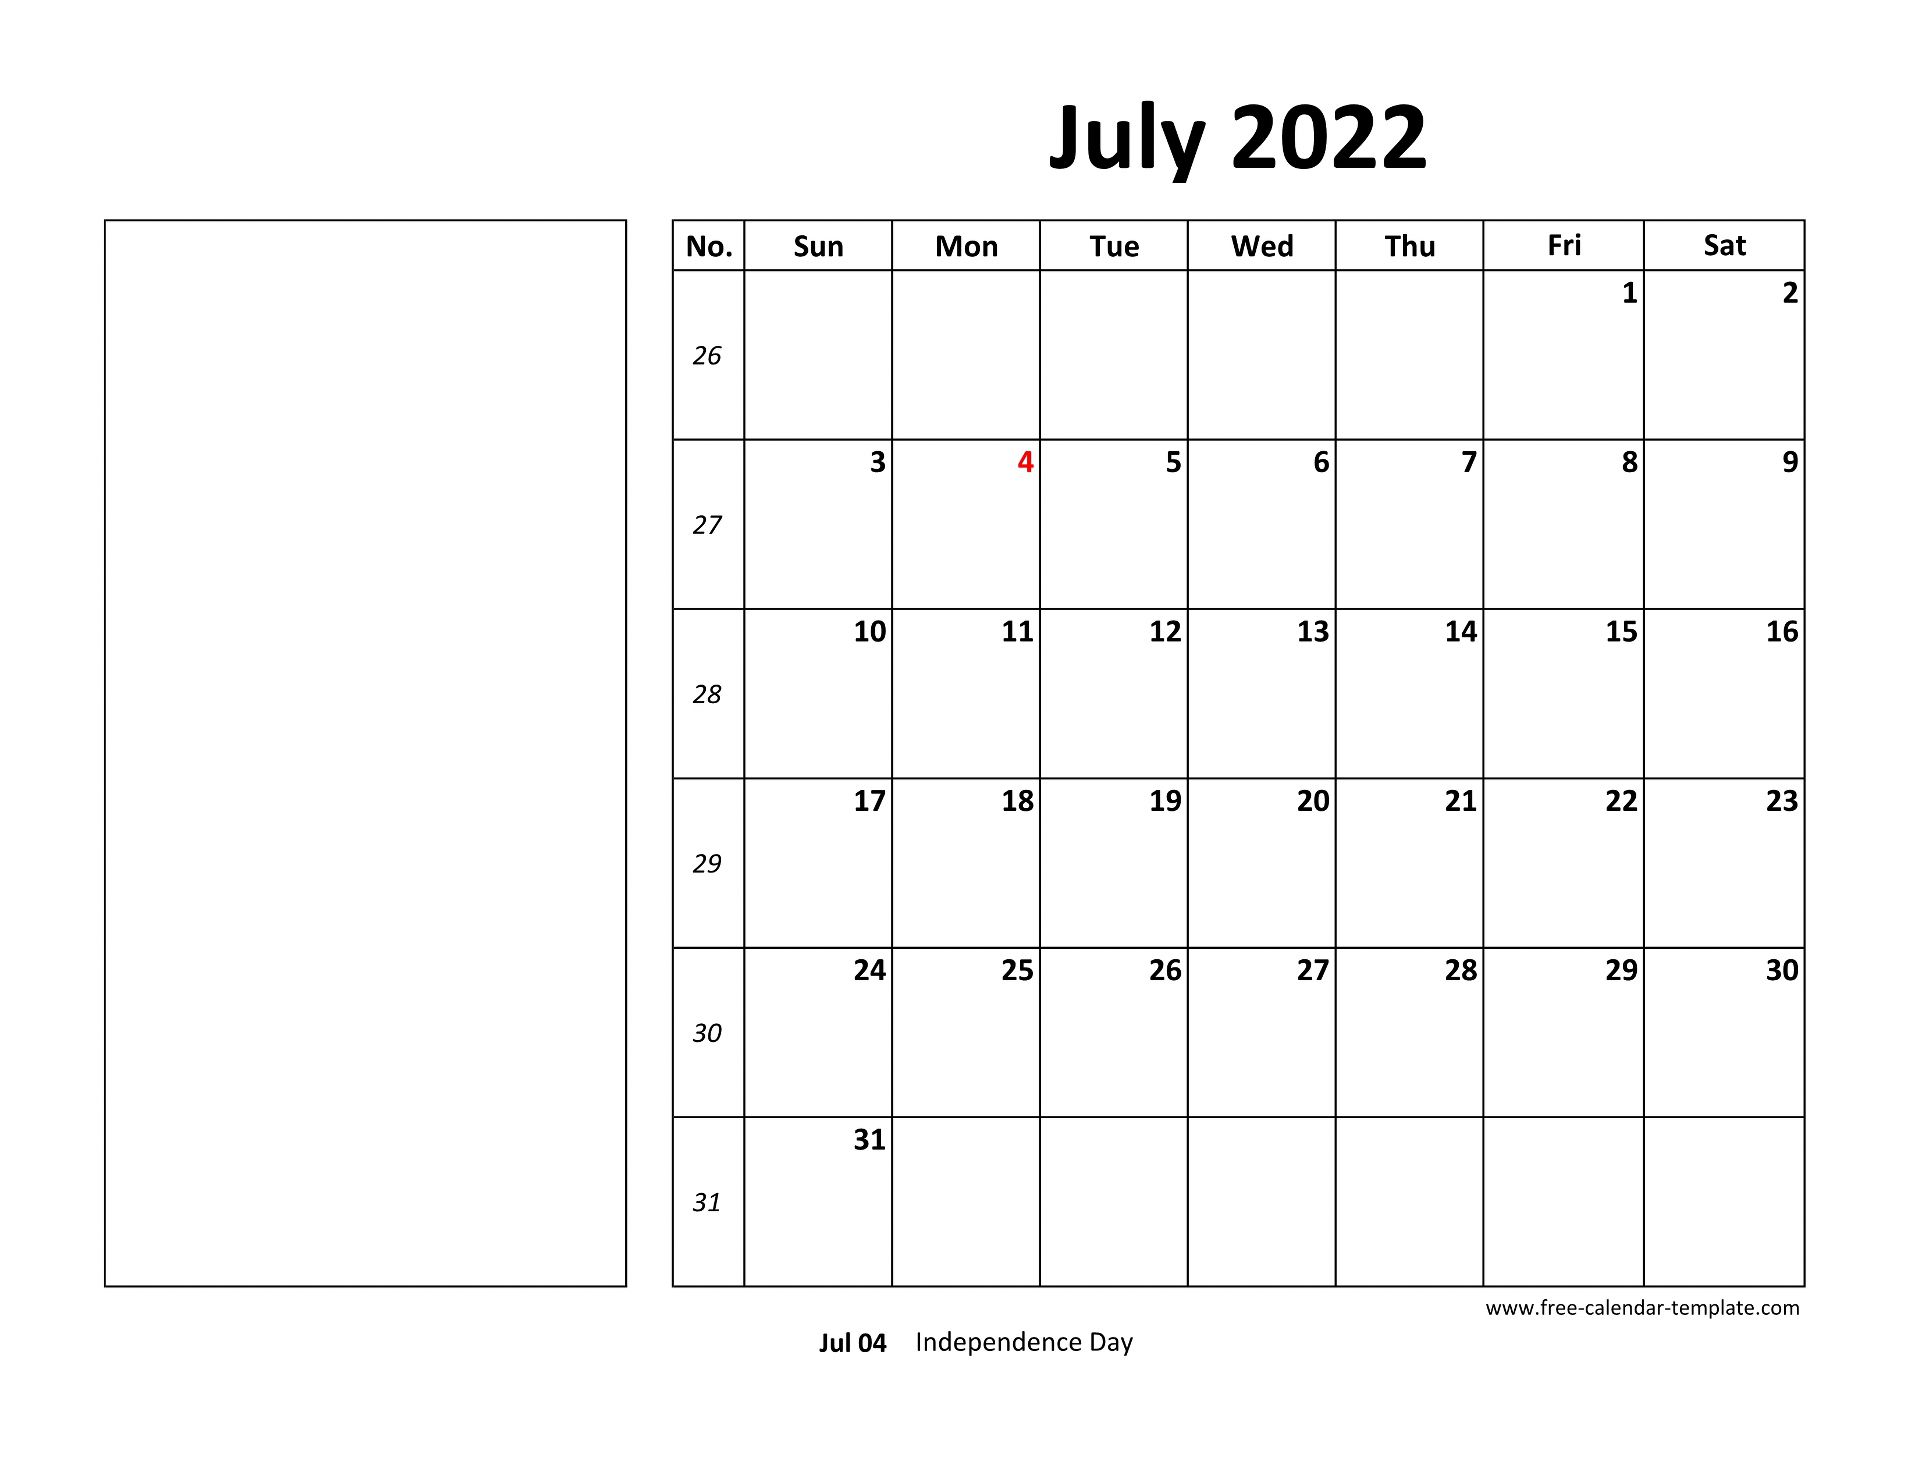 July 2022 Free Calendar Tempplate | Free-calendar-template.com